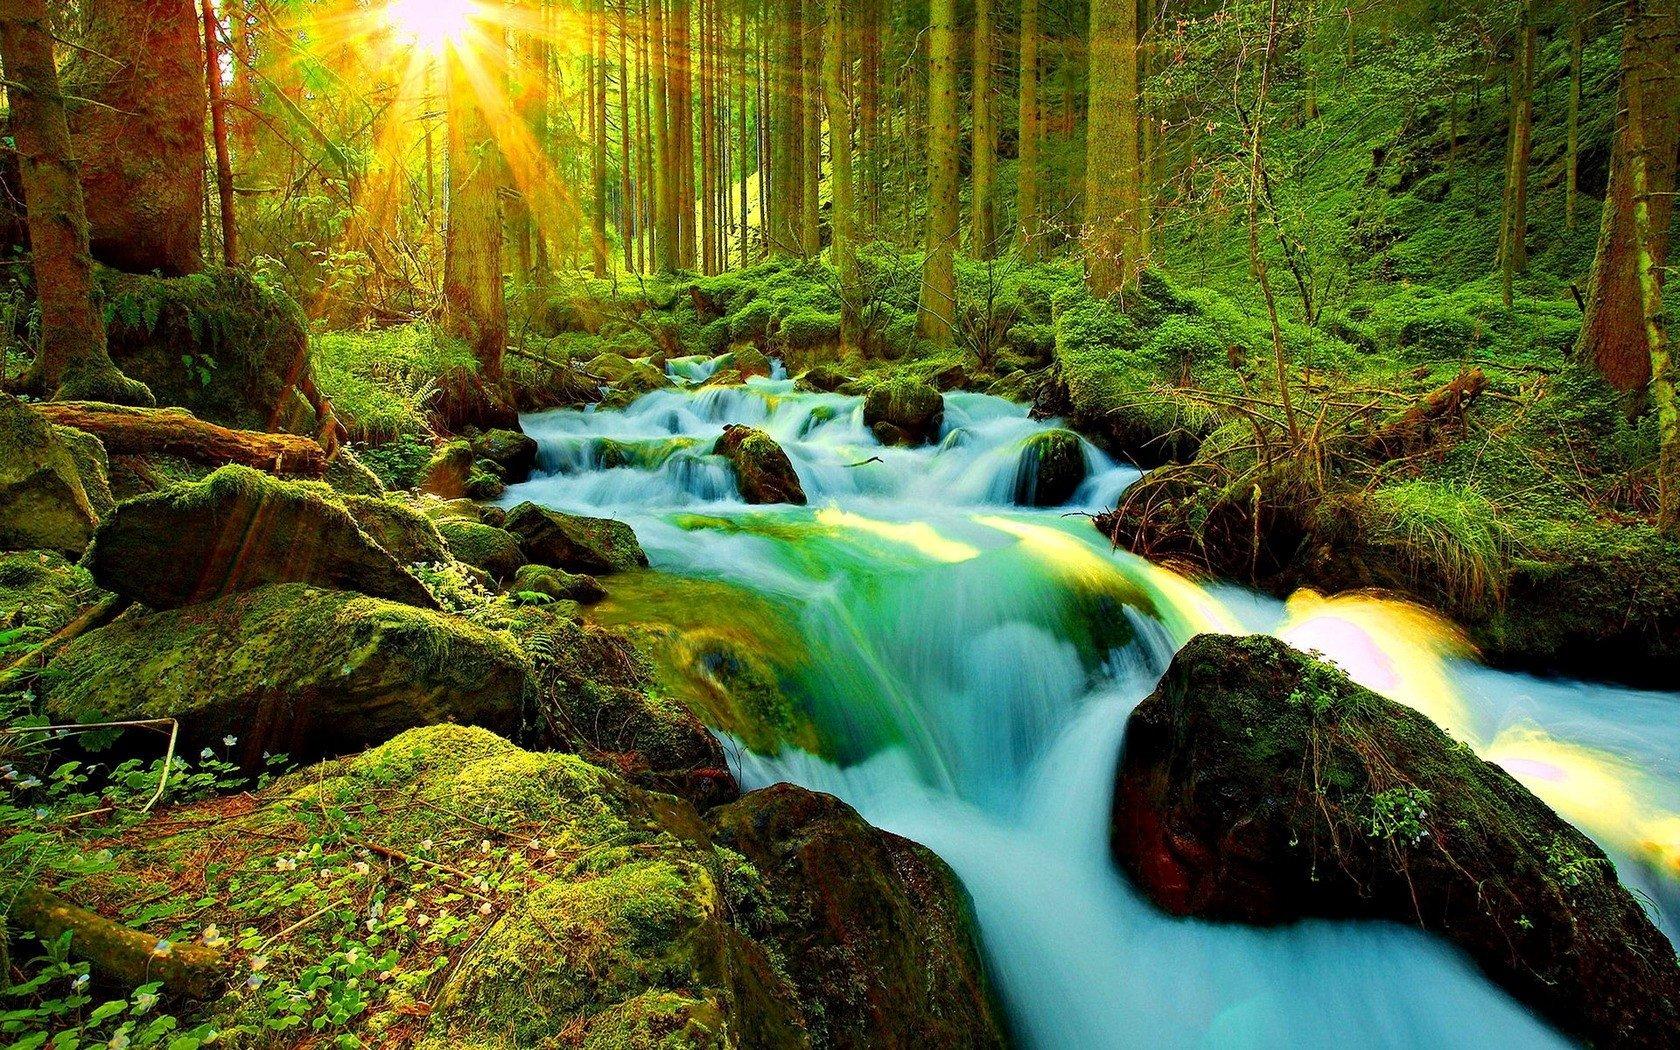 Jog Falls Hd Wallpaper Sunshine On Forest Stream Wallpaper And Background Image